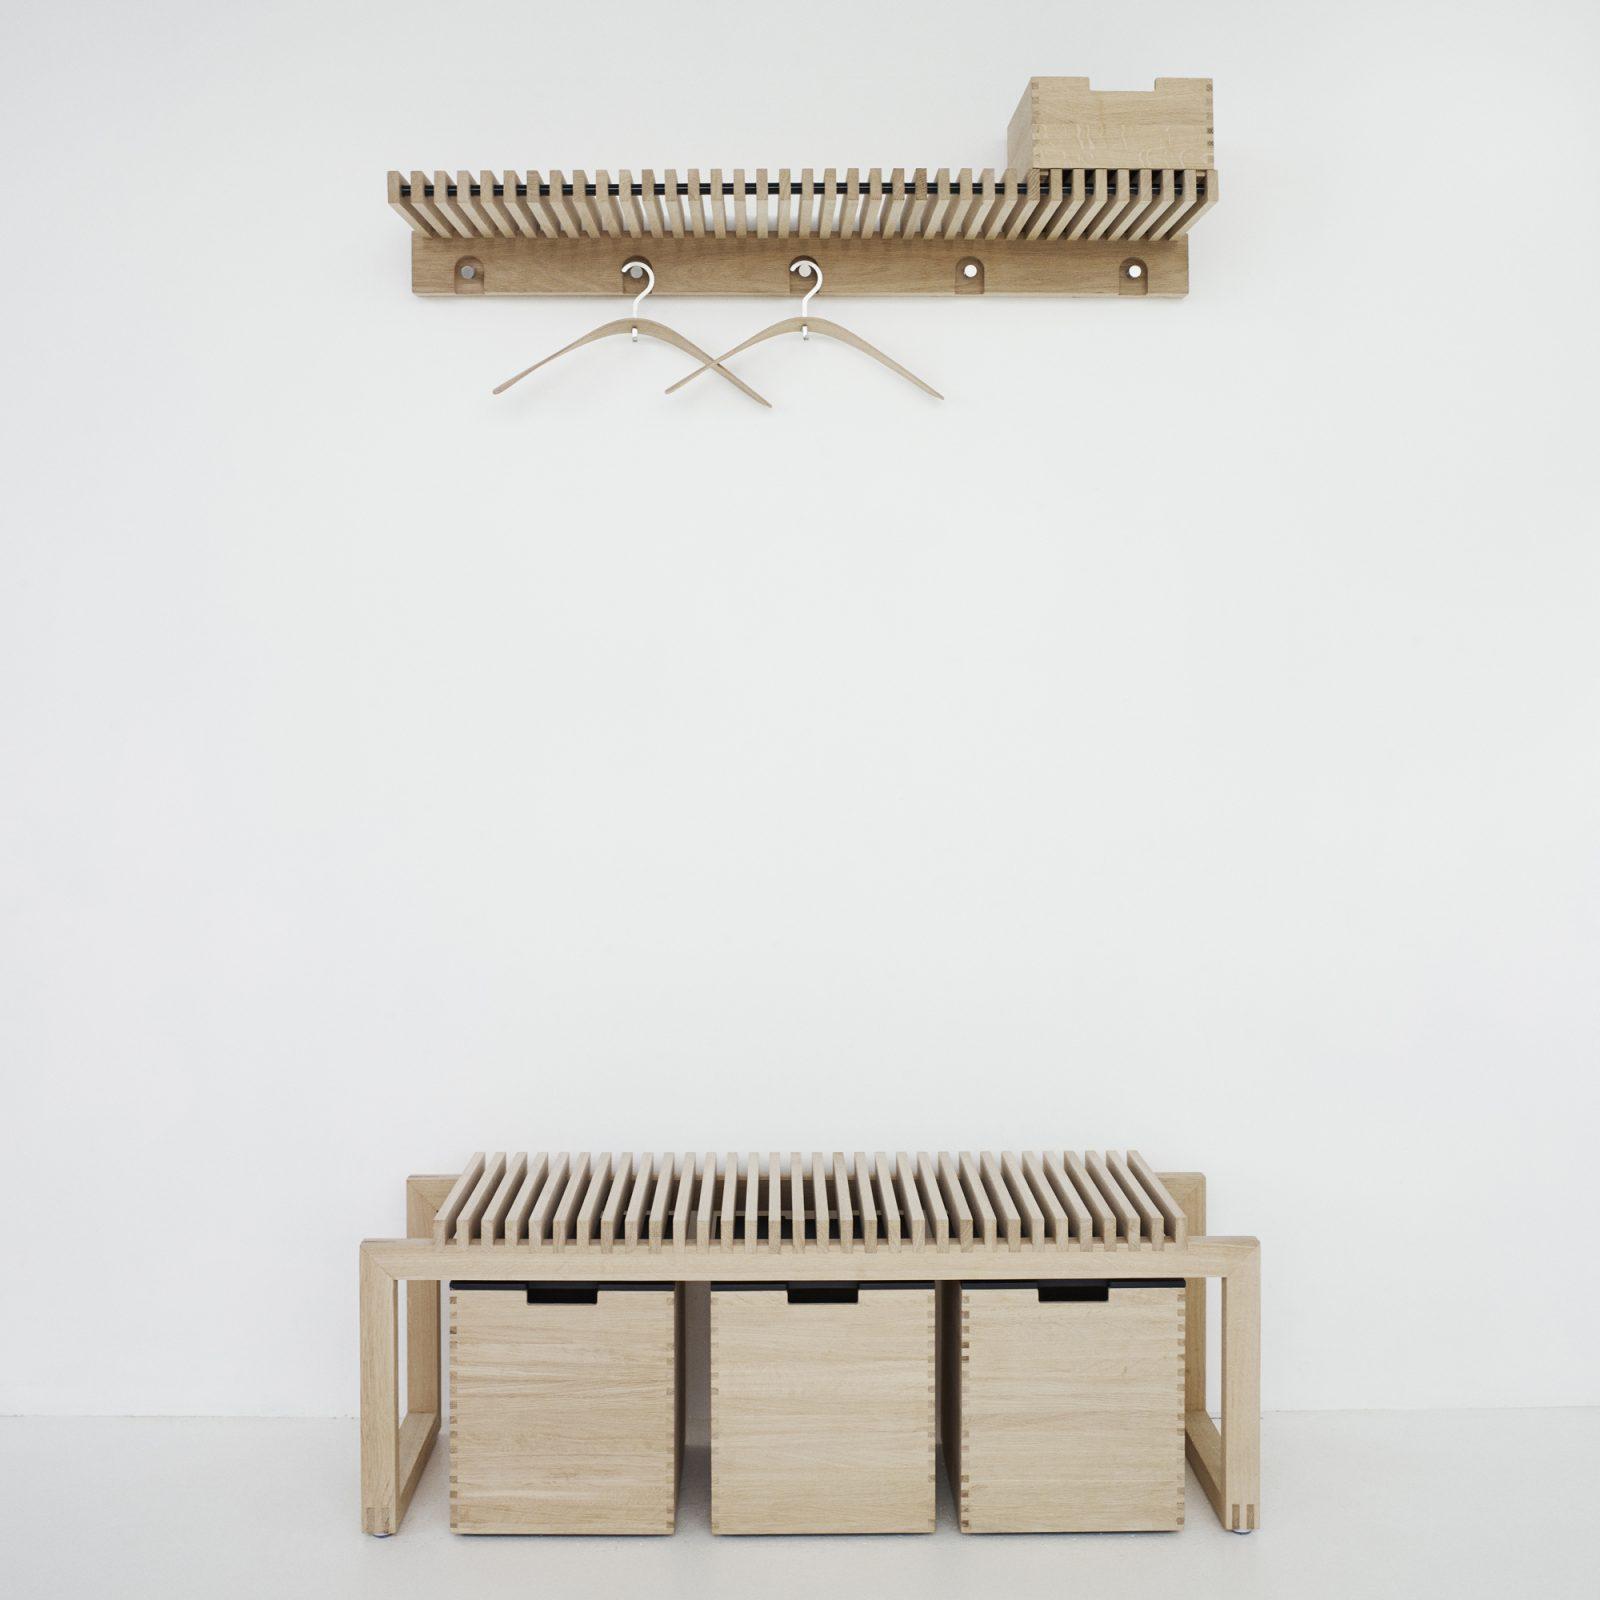 cutter-box-small-1